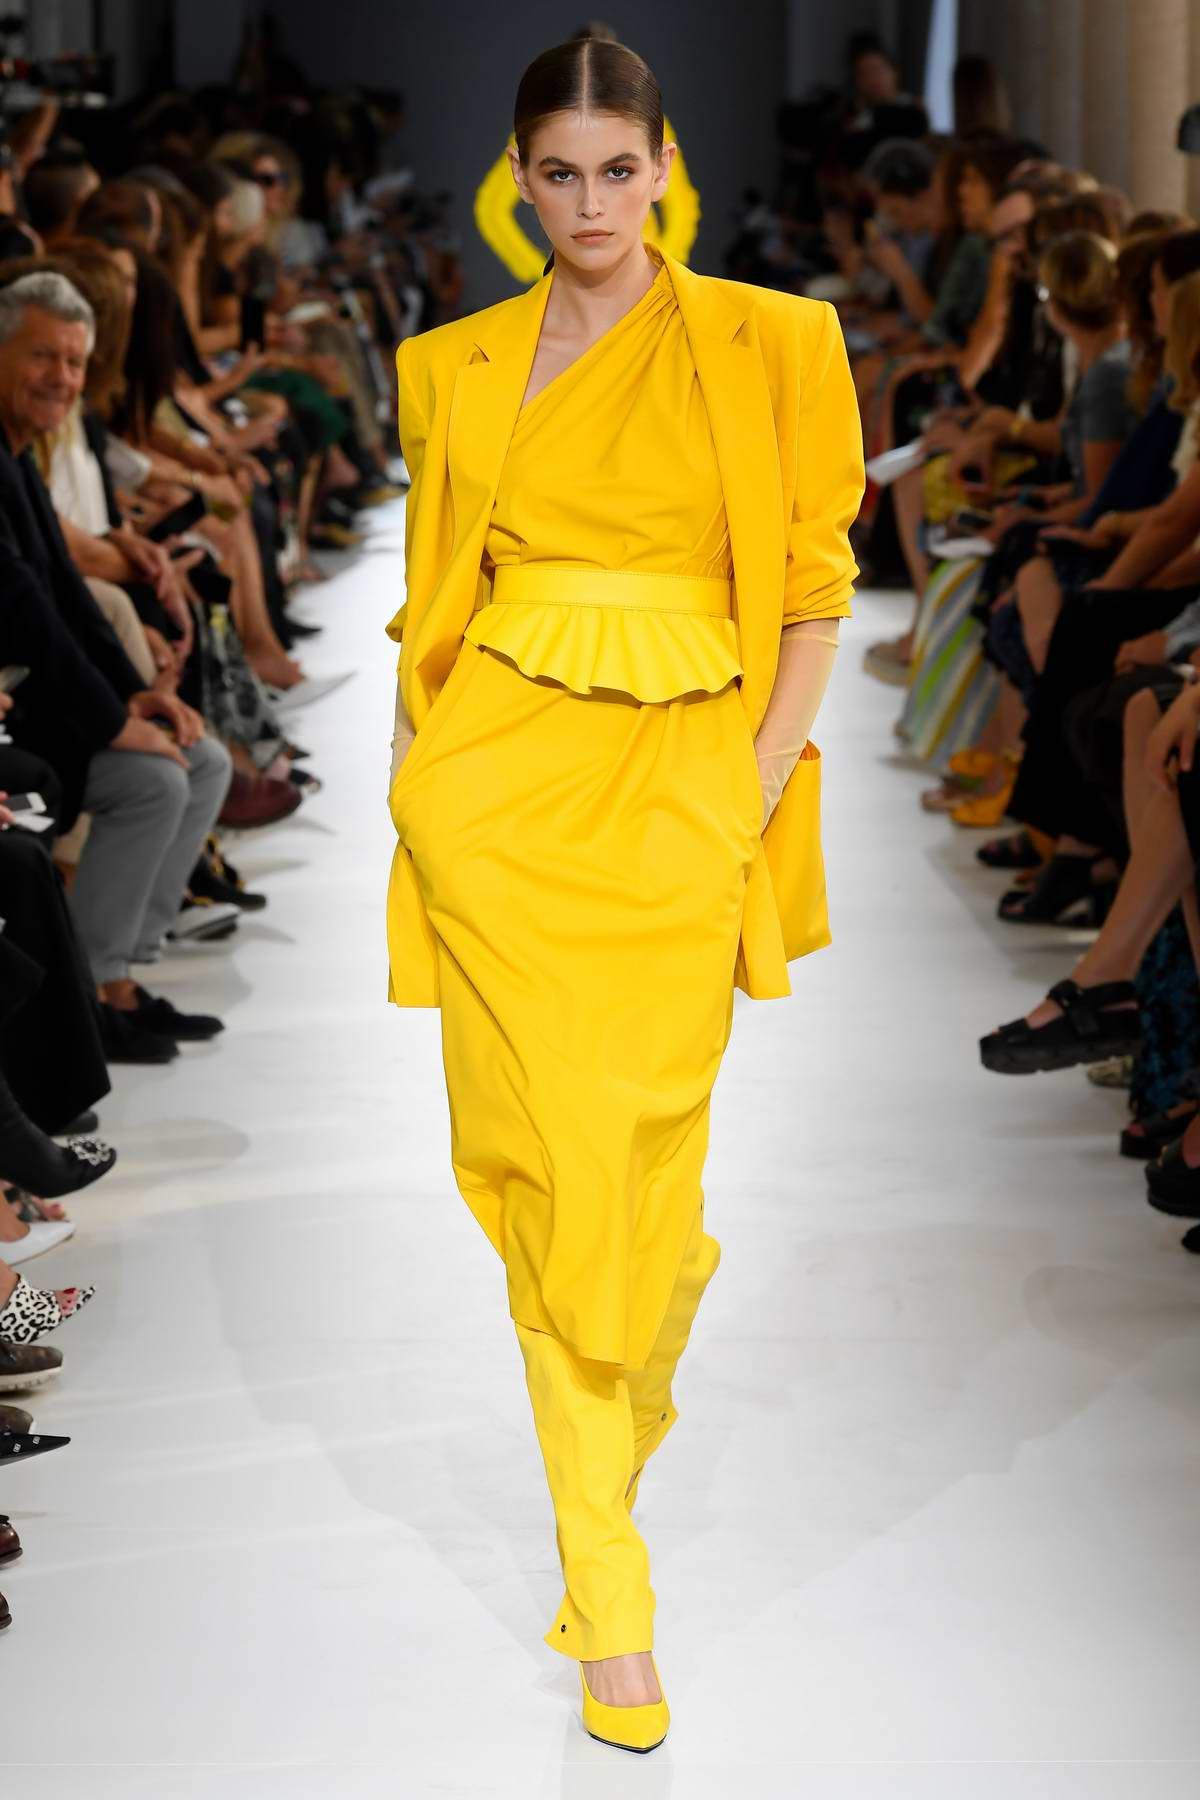 Kaia Gerber walks the runway for Max Mara Show, Summer-Spring 2019 during Milan Fashion Week in Milan, Italy